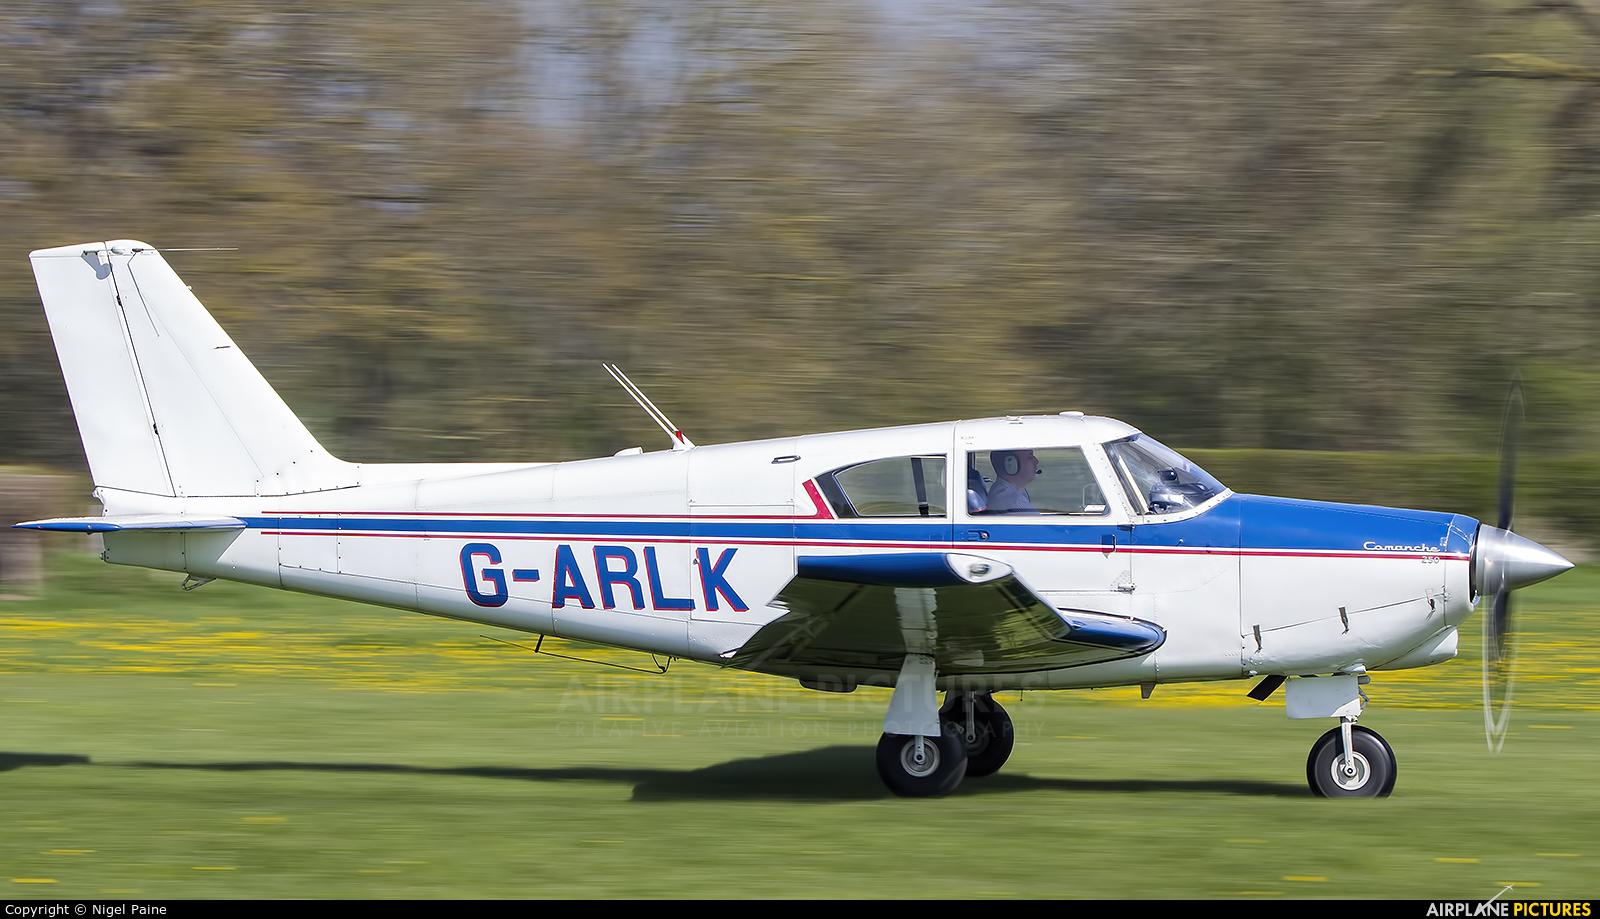 Private G-ARLK aircraft at Lashenden / Headcorn